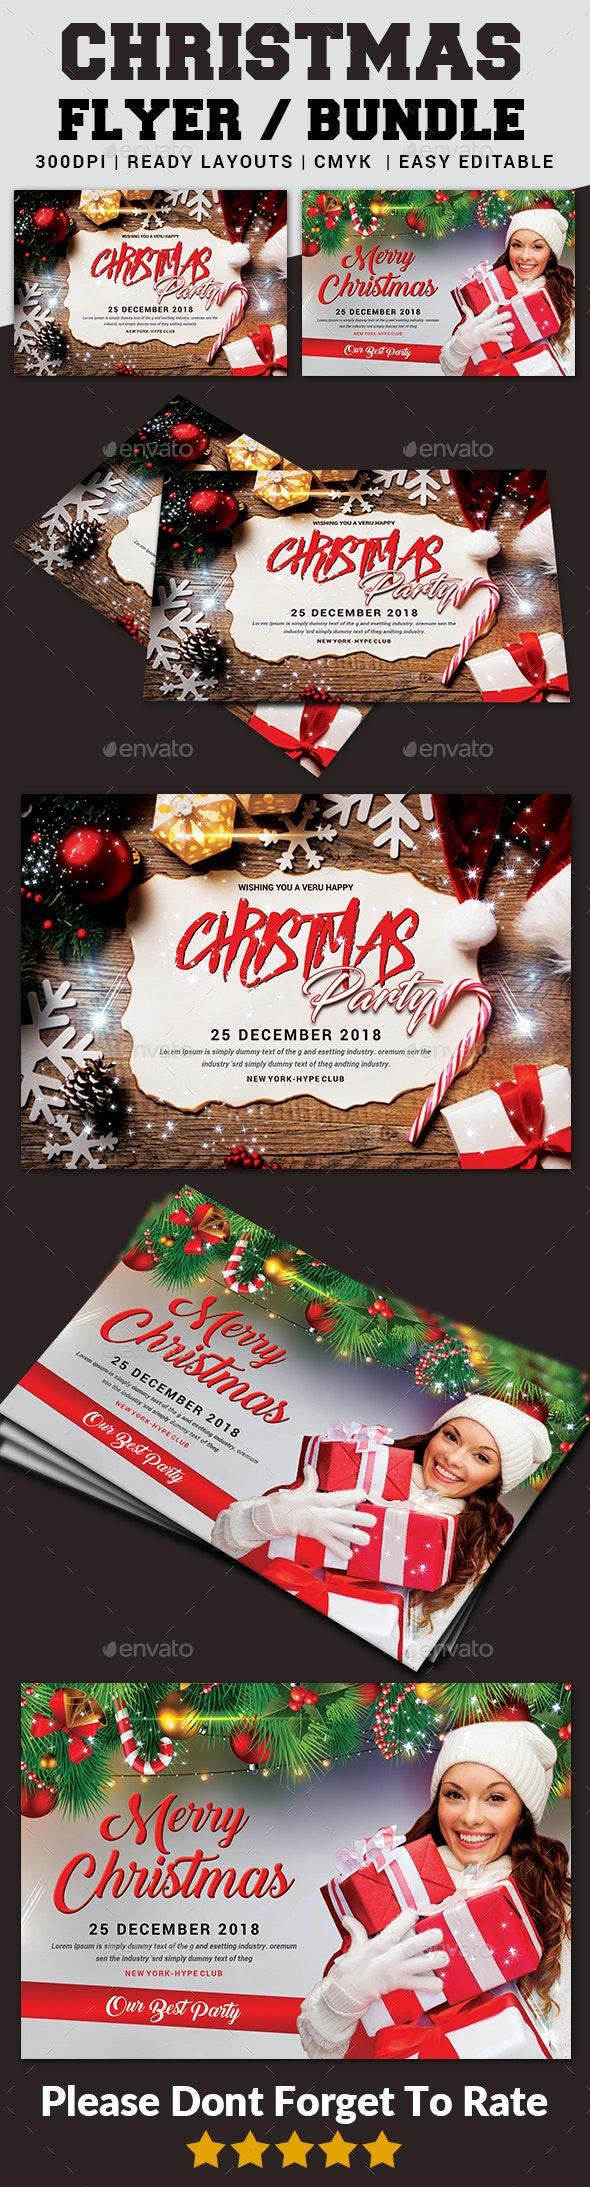 Christmas Flyer Bundle Templates - Events Flyers